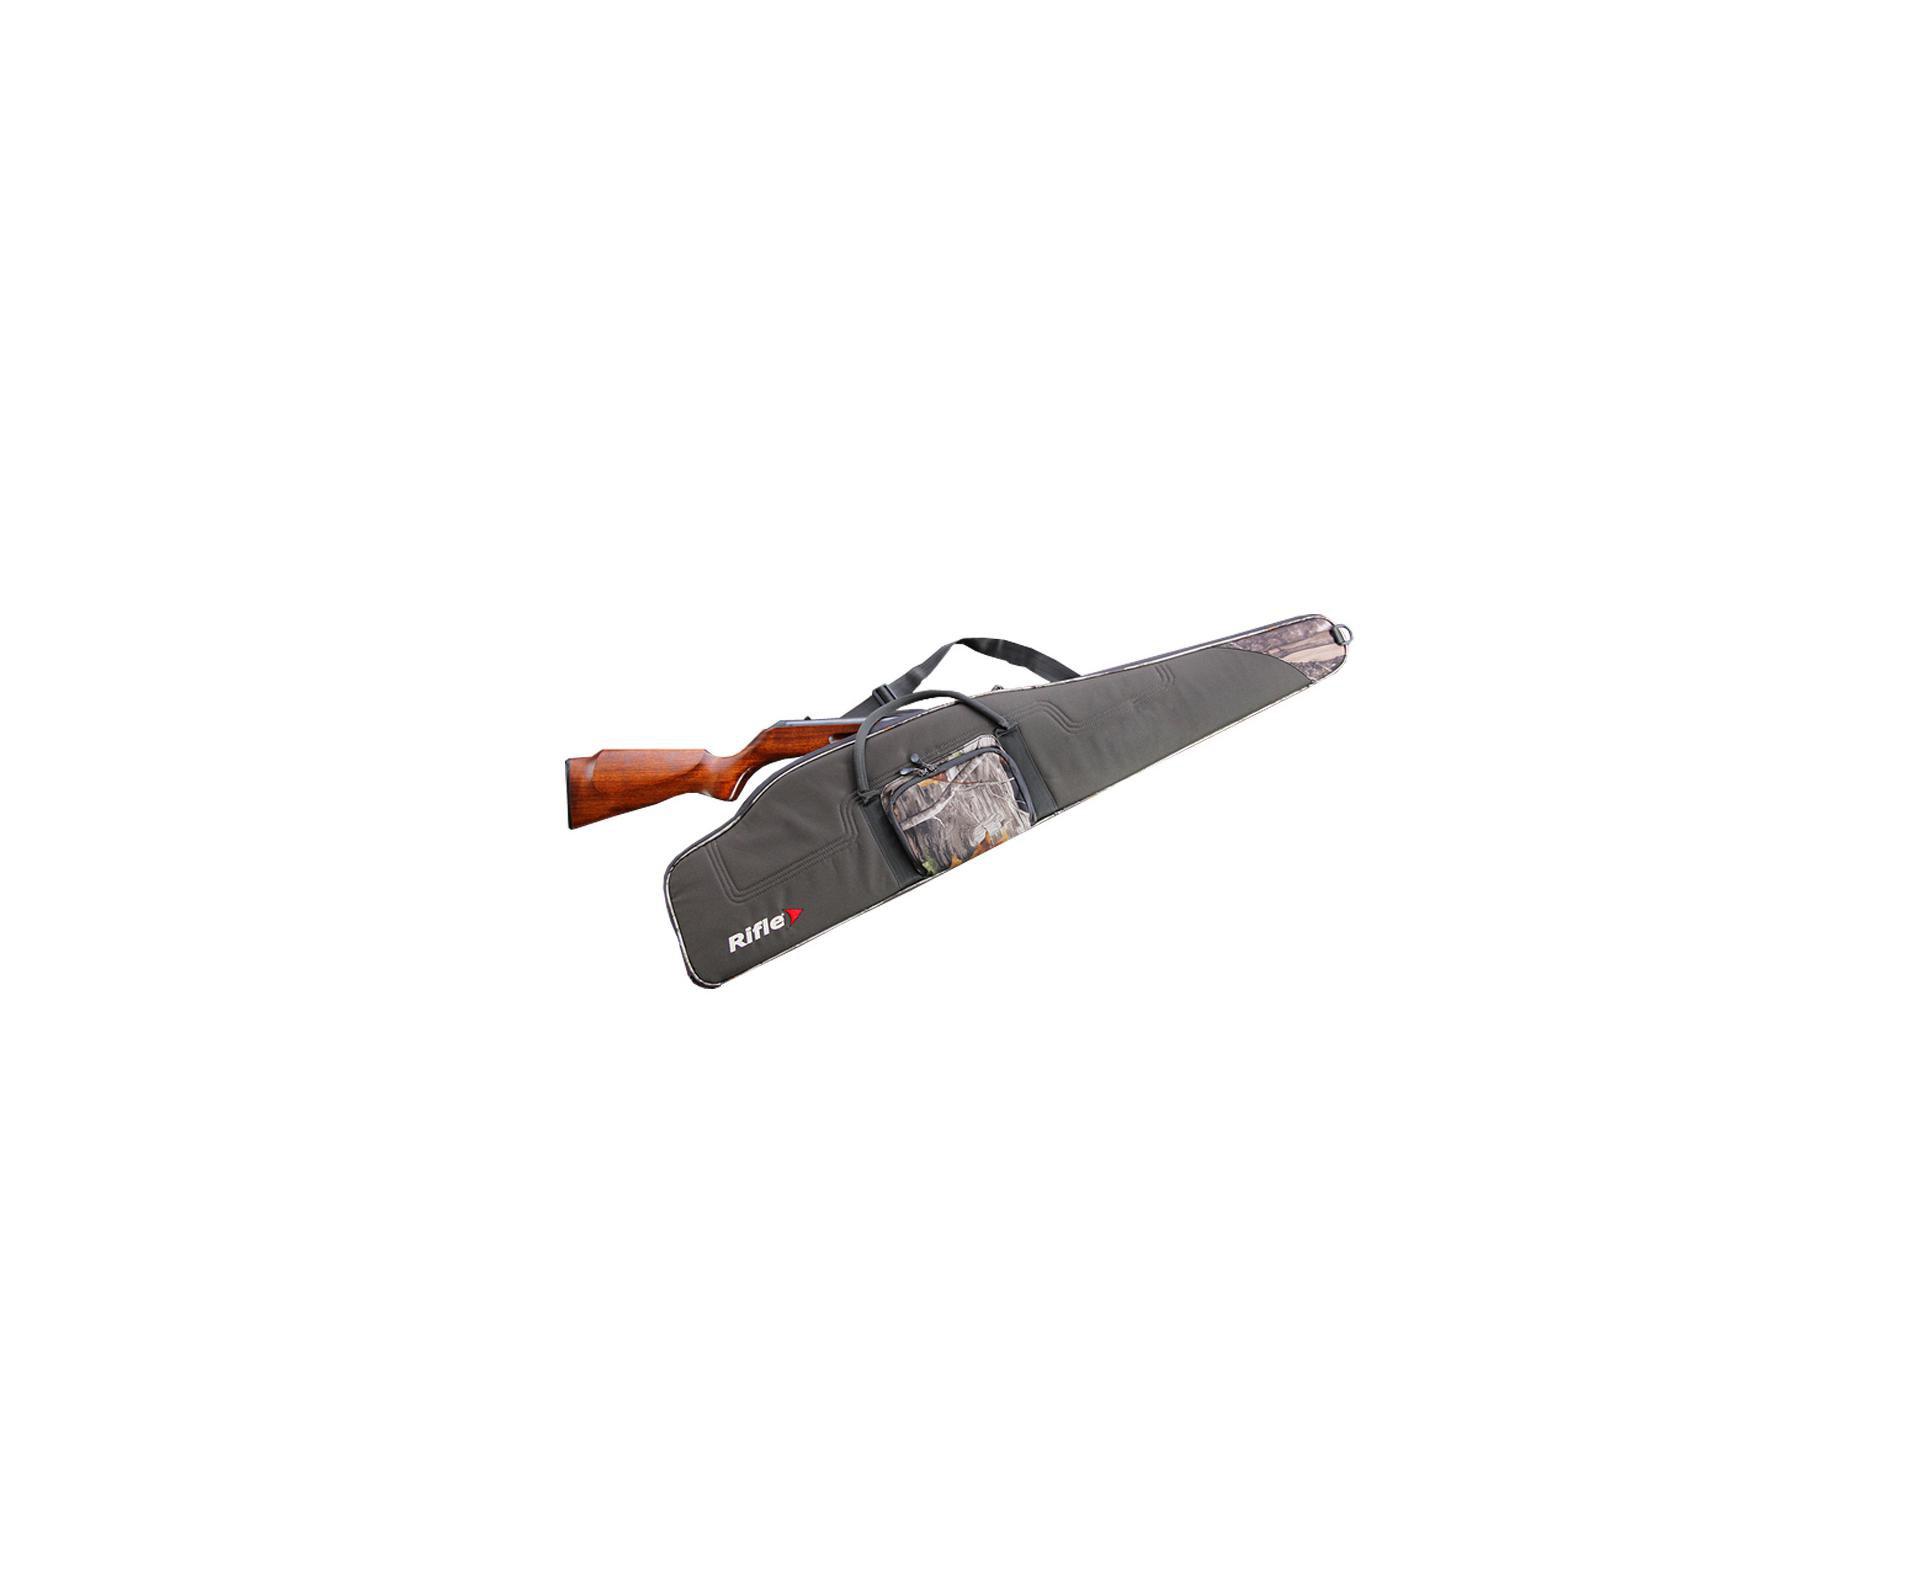 Capa (case) Semi Rígido Arizona - Rifle